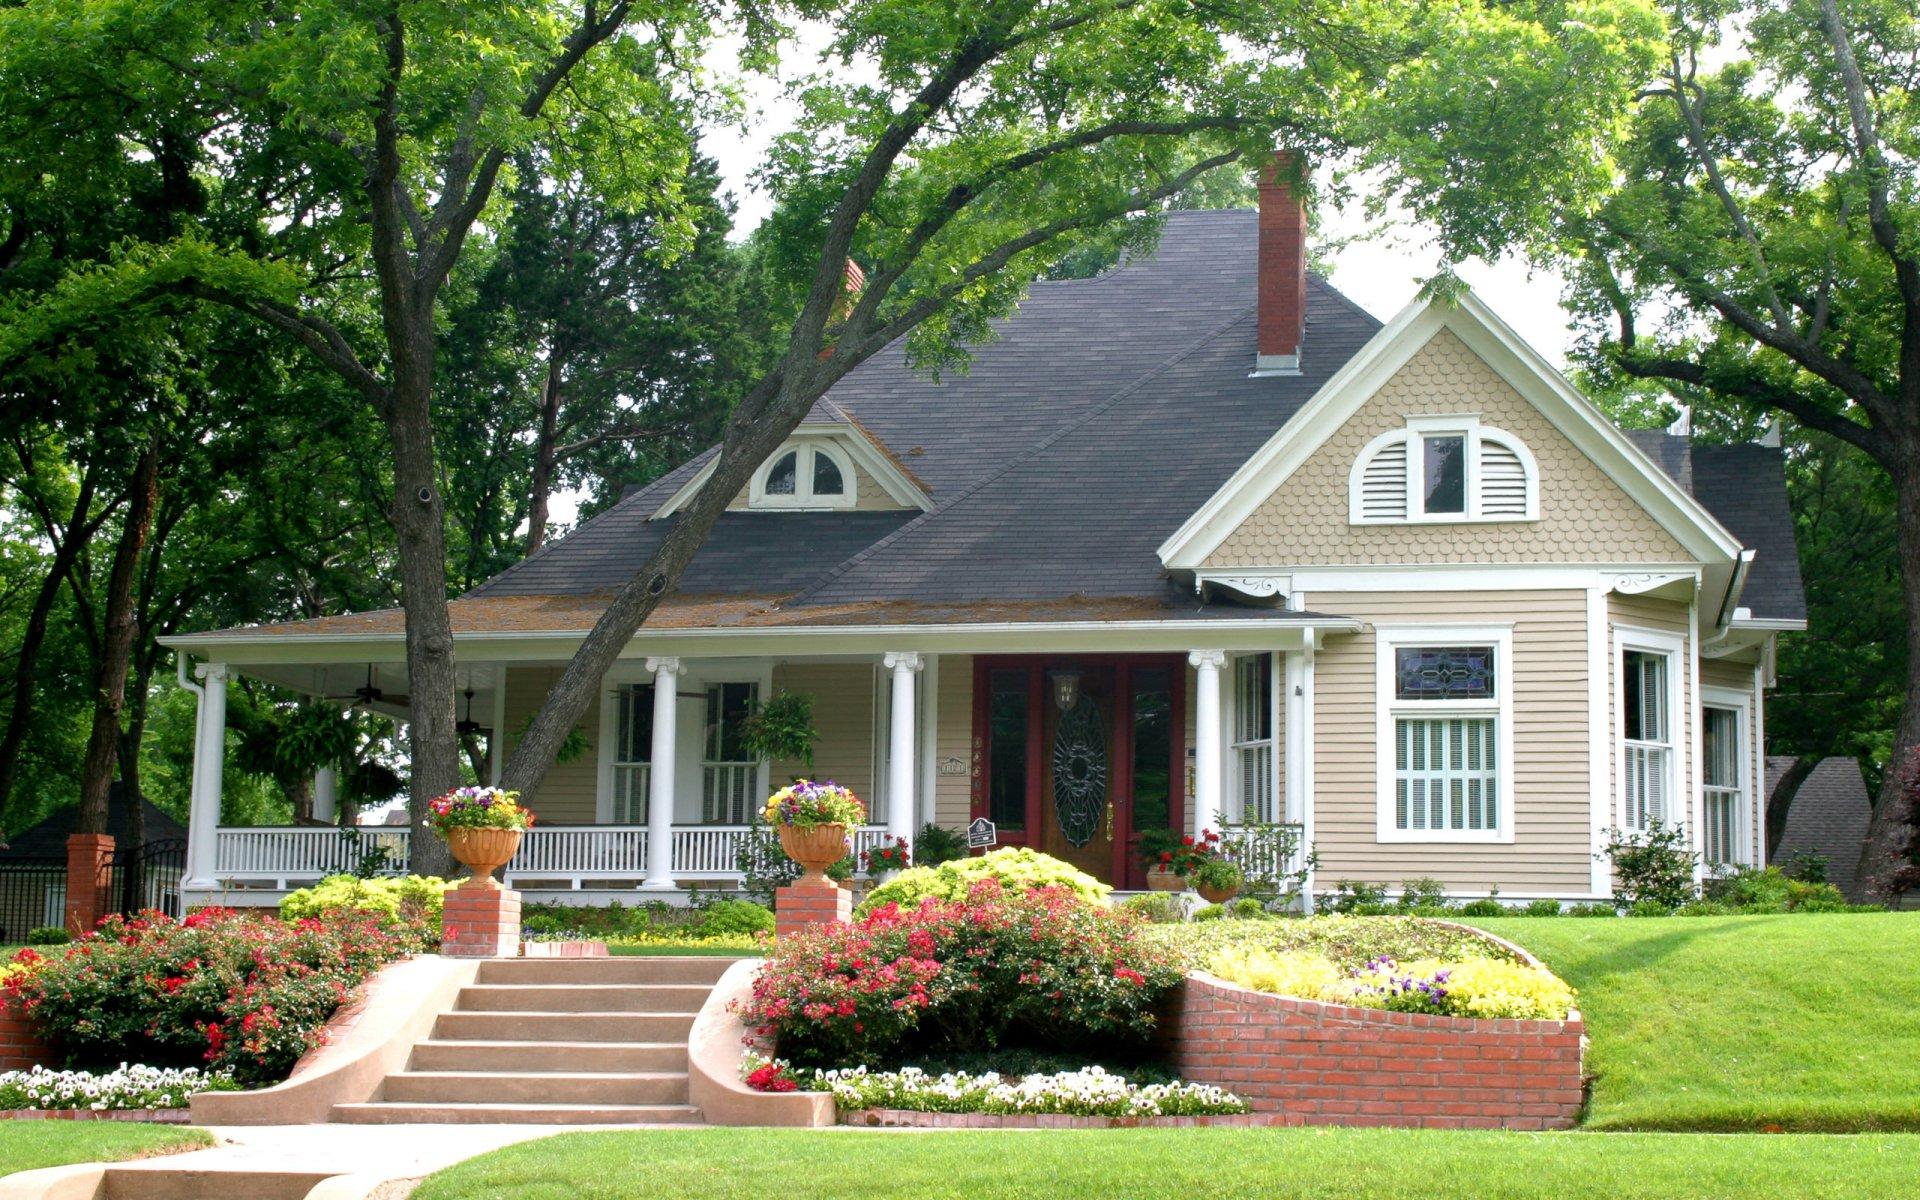 Фото с изображением дома